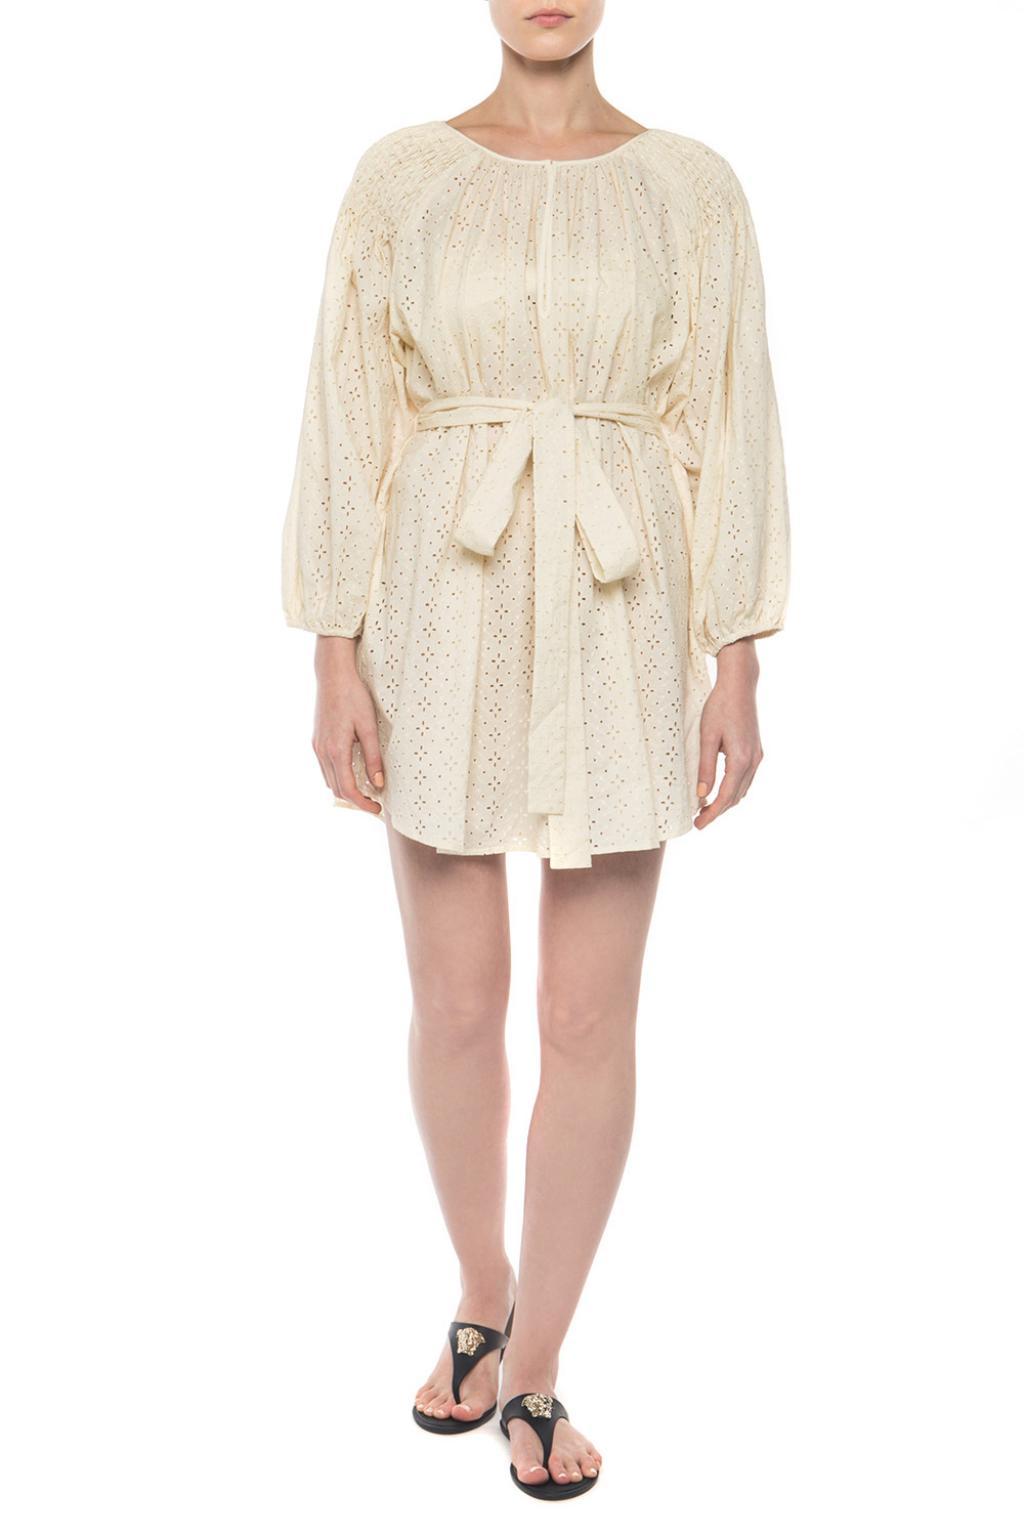 Marysia Perforated dress